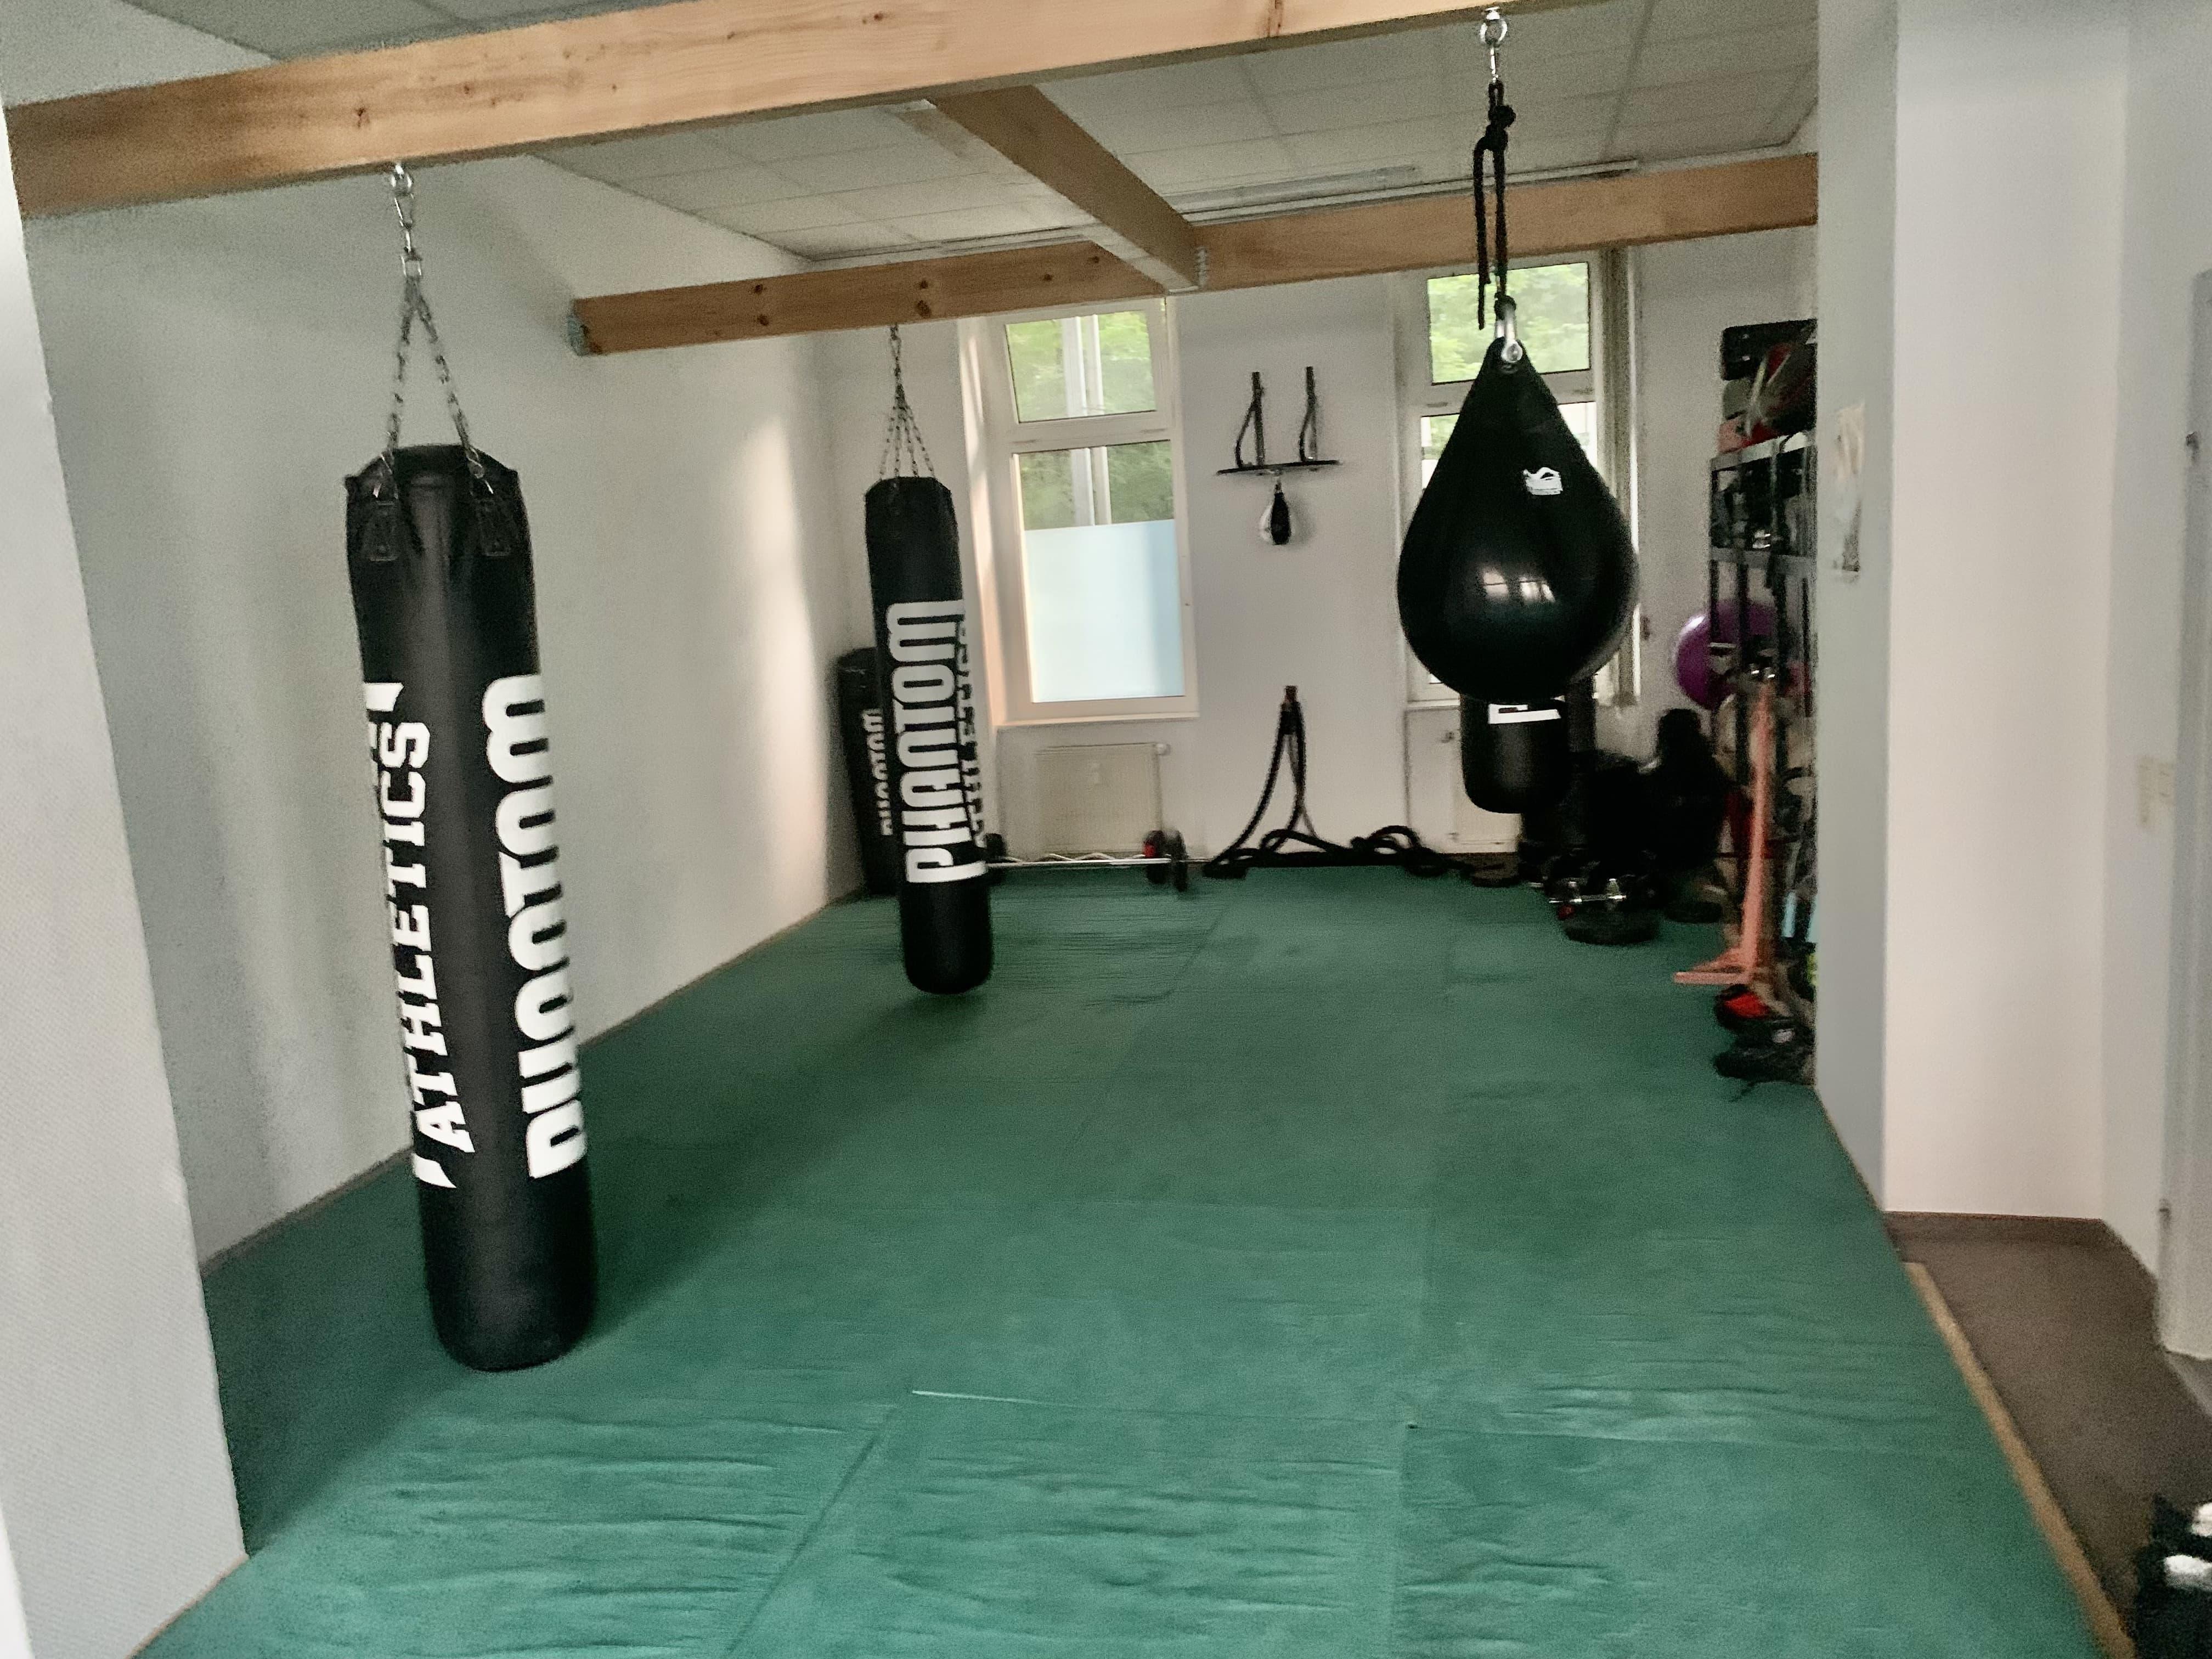 Ad Victoriam Gym - Kickboxing in Leipzig